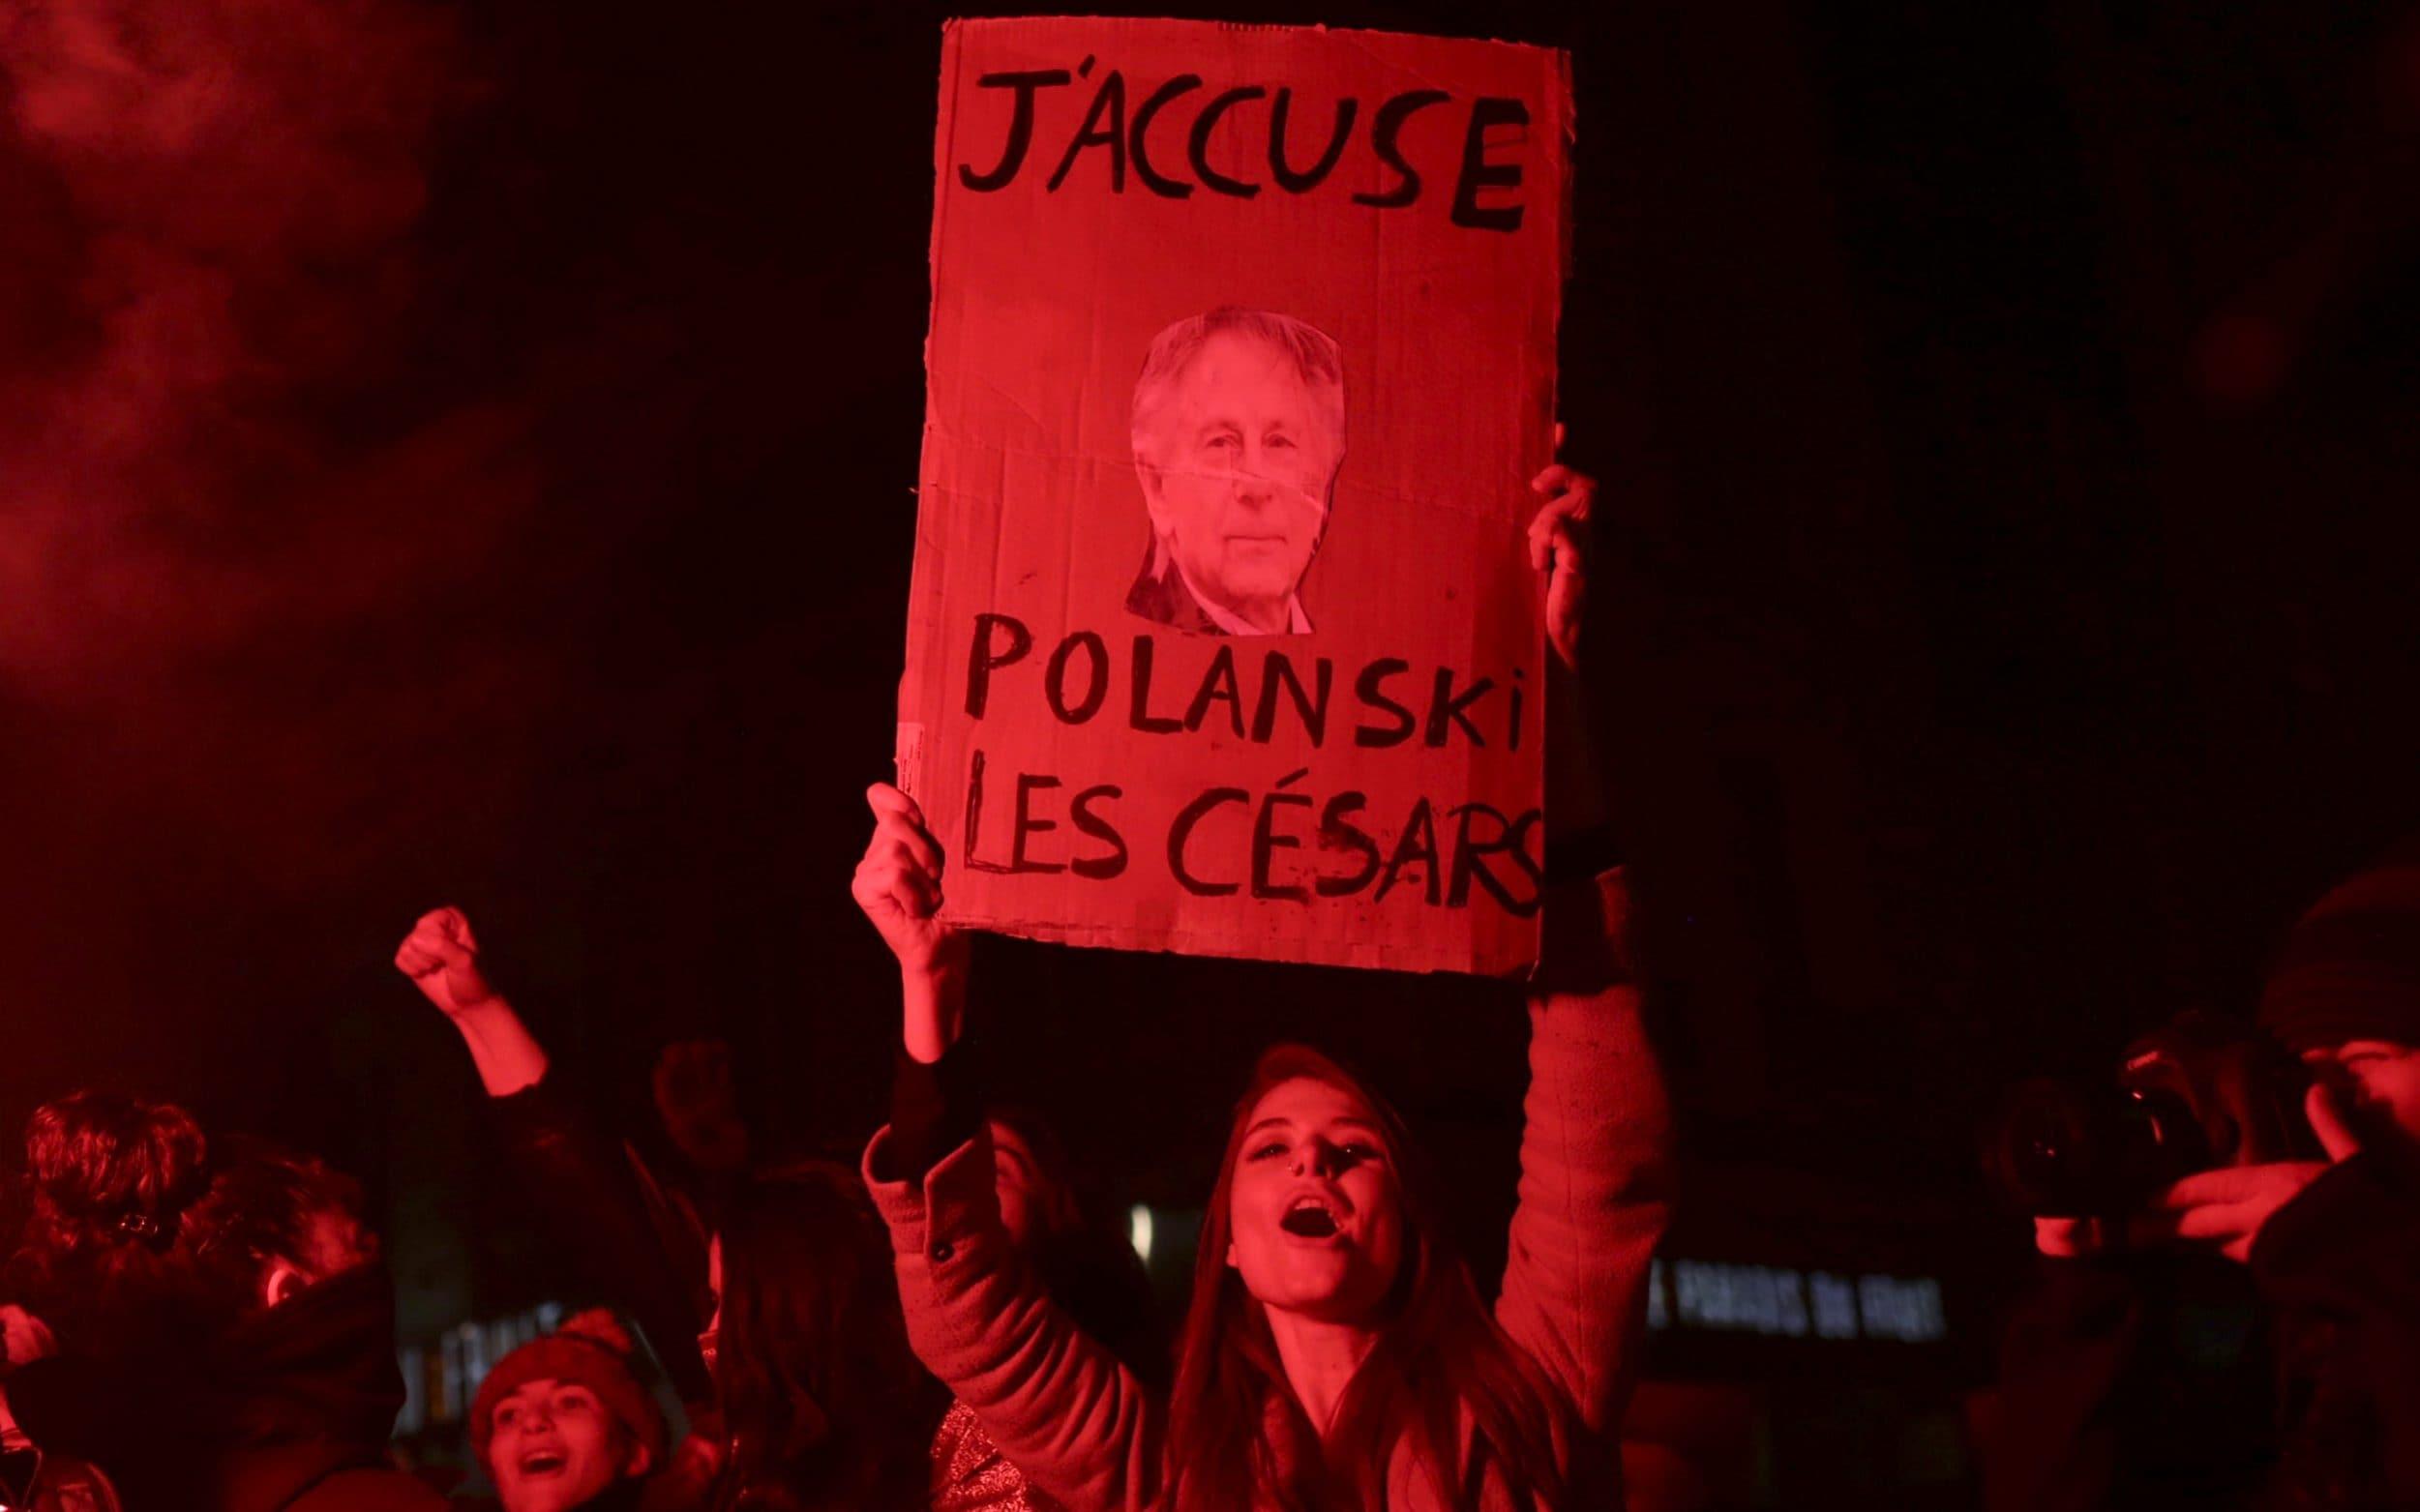 César 2020, proteste per Polański all'urlo di «Bravo la pédophilie!»